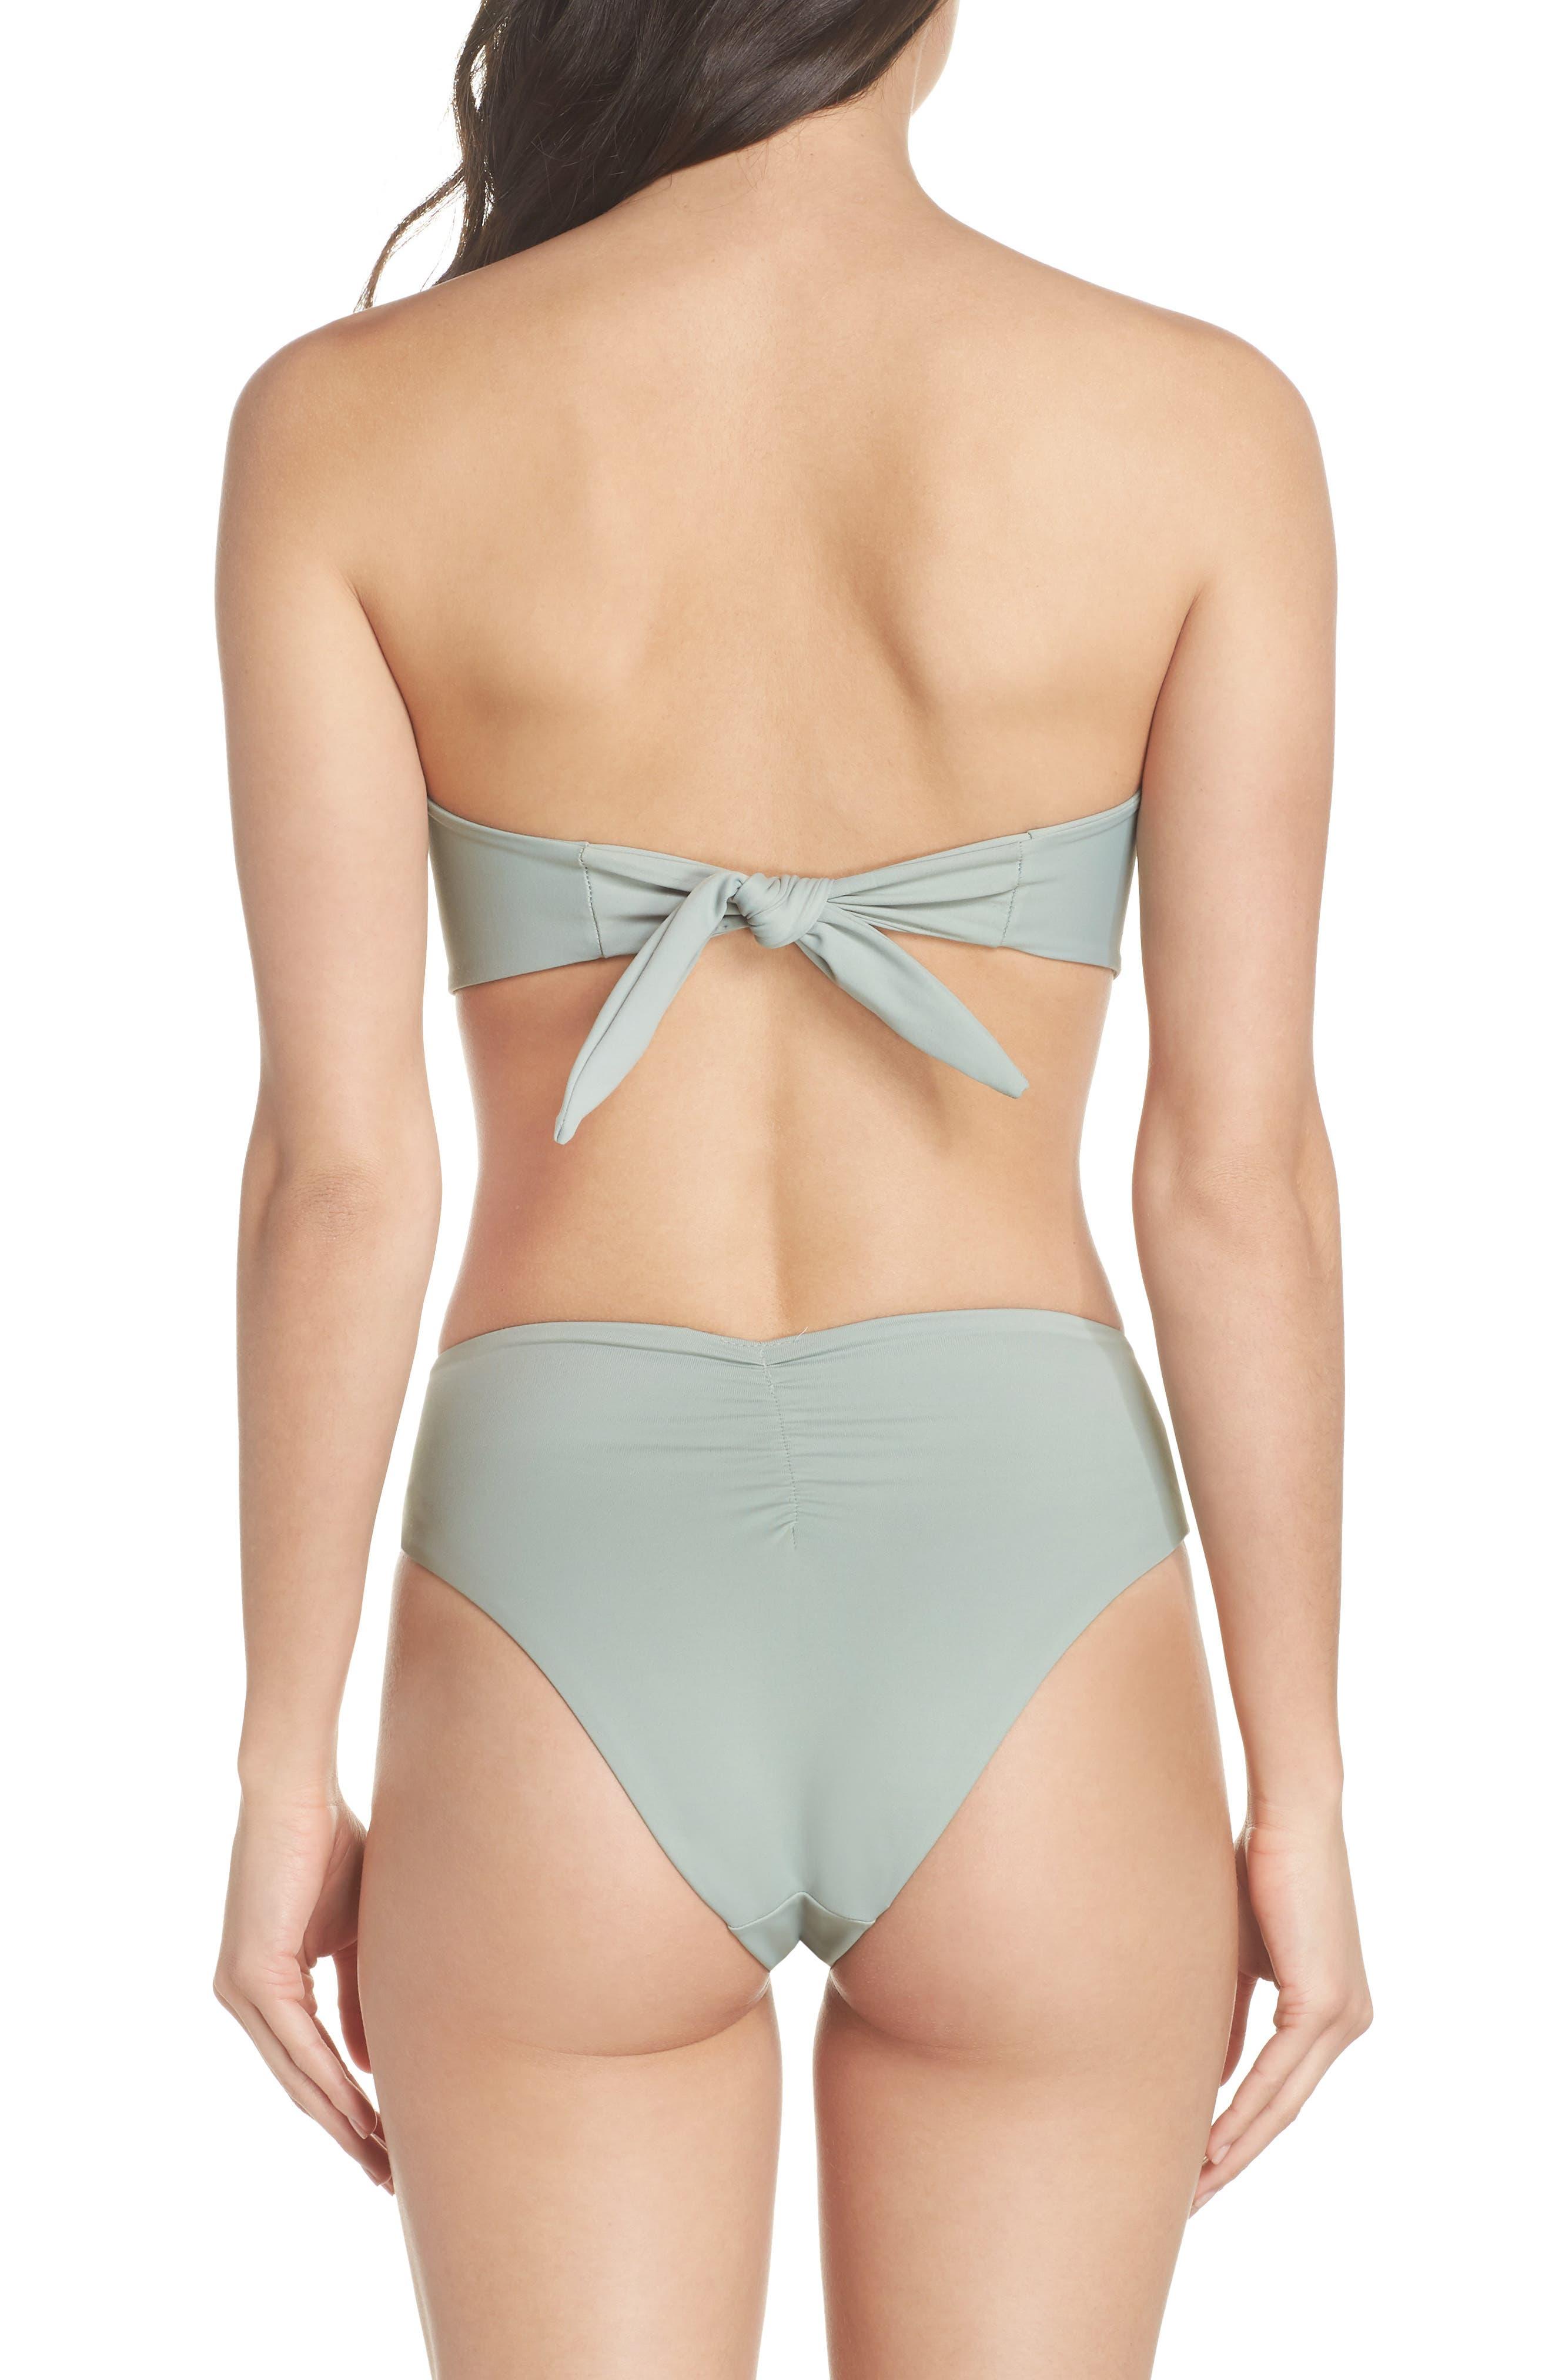 Paula Tie-Up Bikini Bottoms,                             Alternate thumbnail 6, color,                             Pistache Green